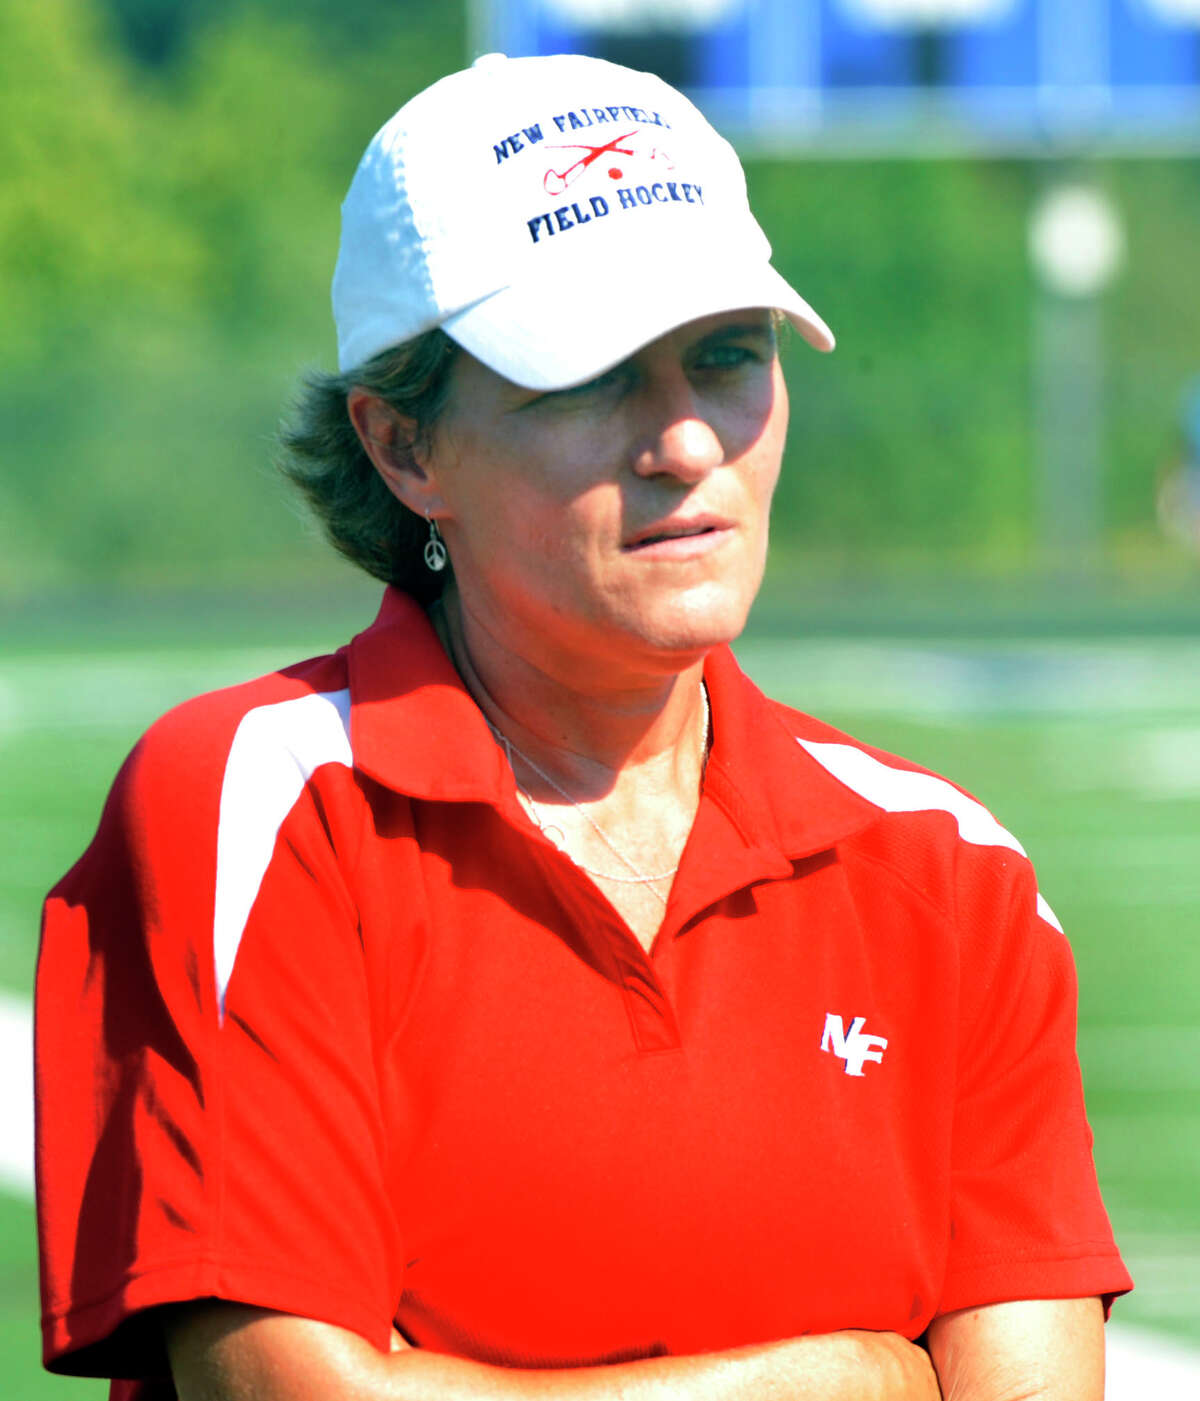 Karen Nell coaches New Fairfield at the Mustang Mix-up Field Hockey Jamboree in Danbury Saturday, Sept. 1, 2012.